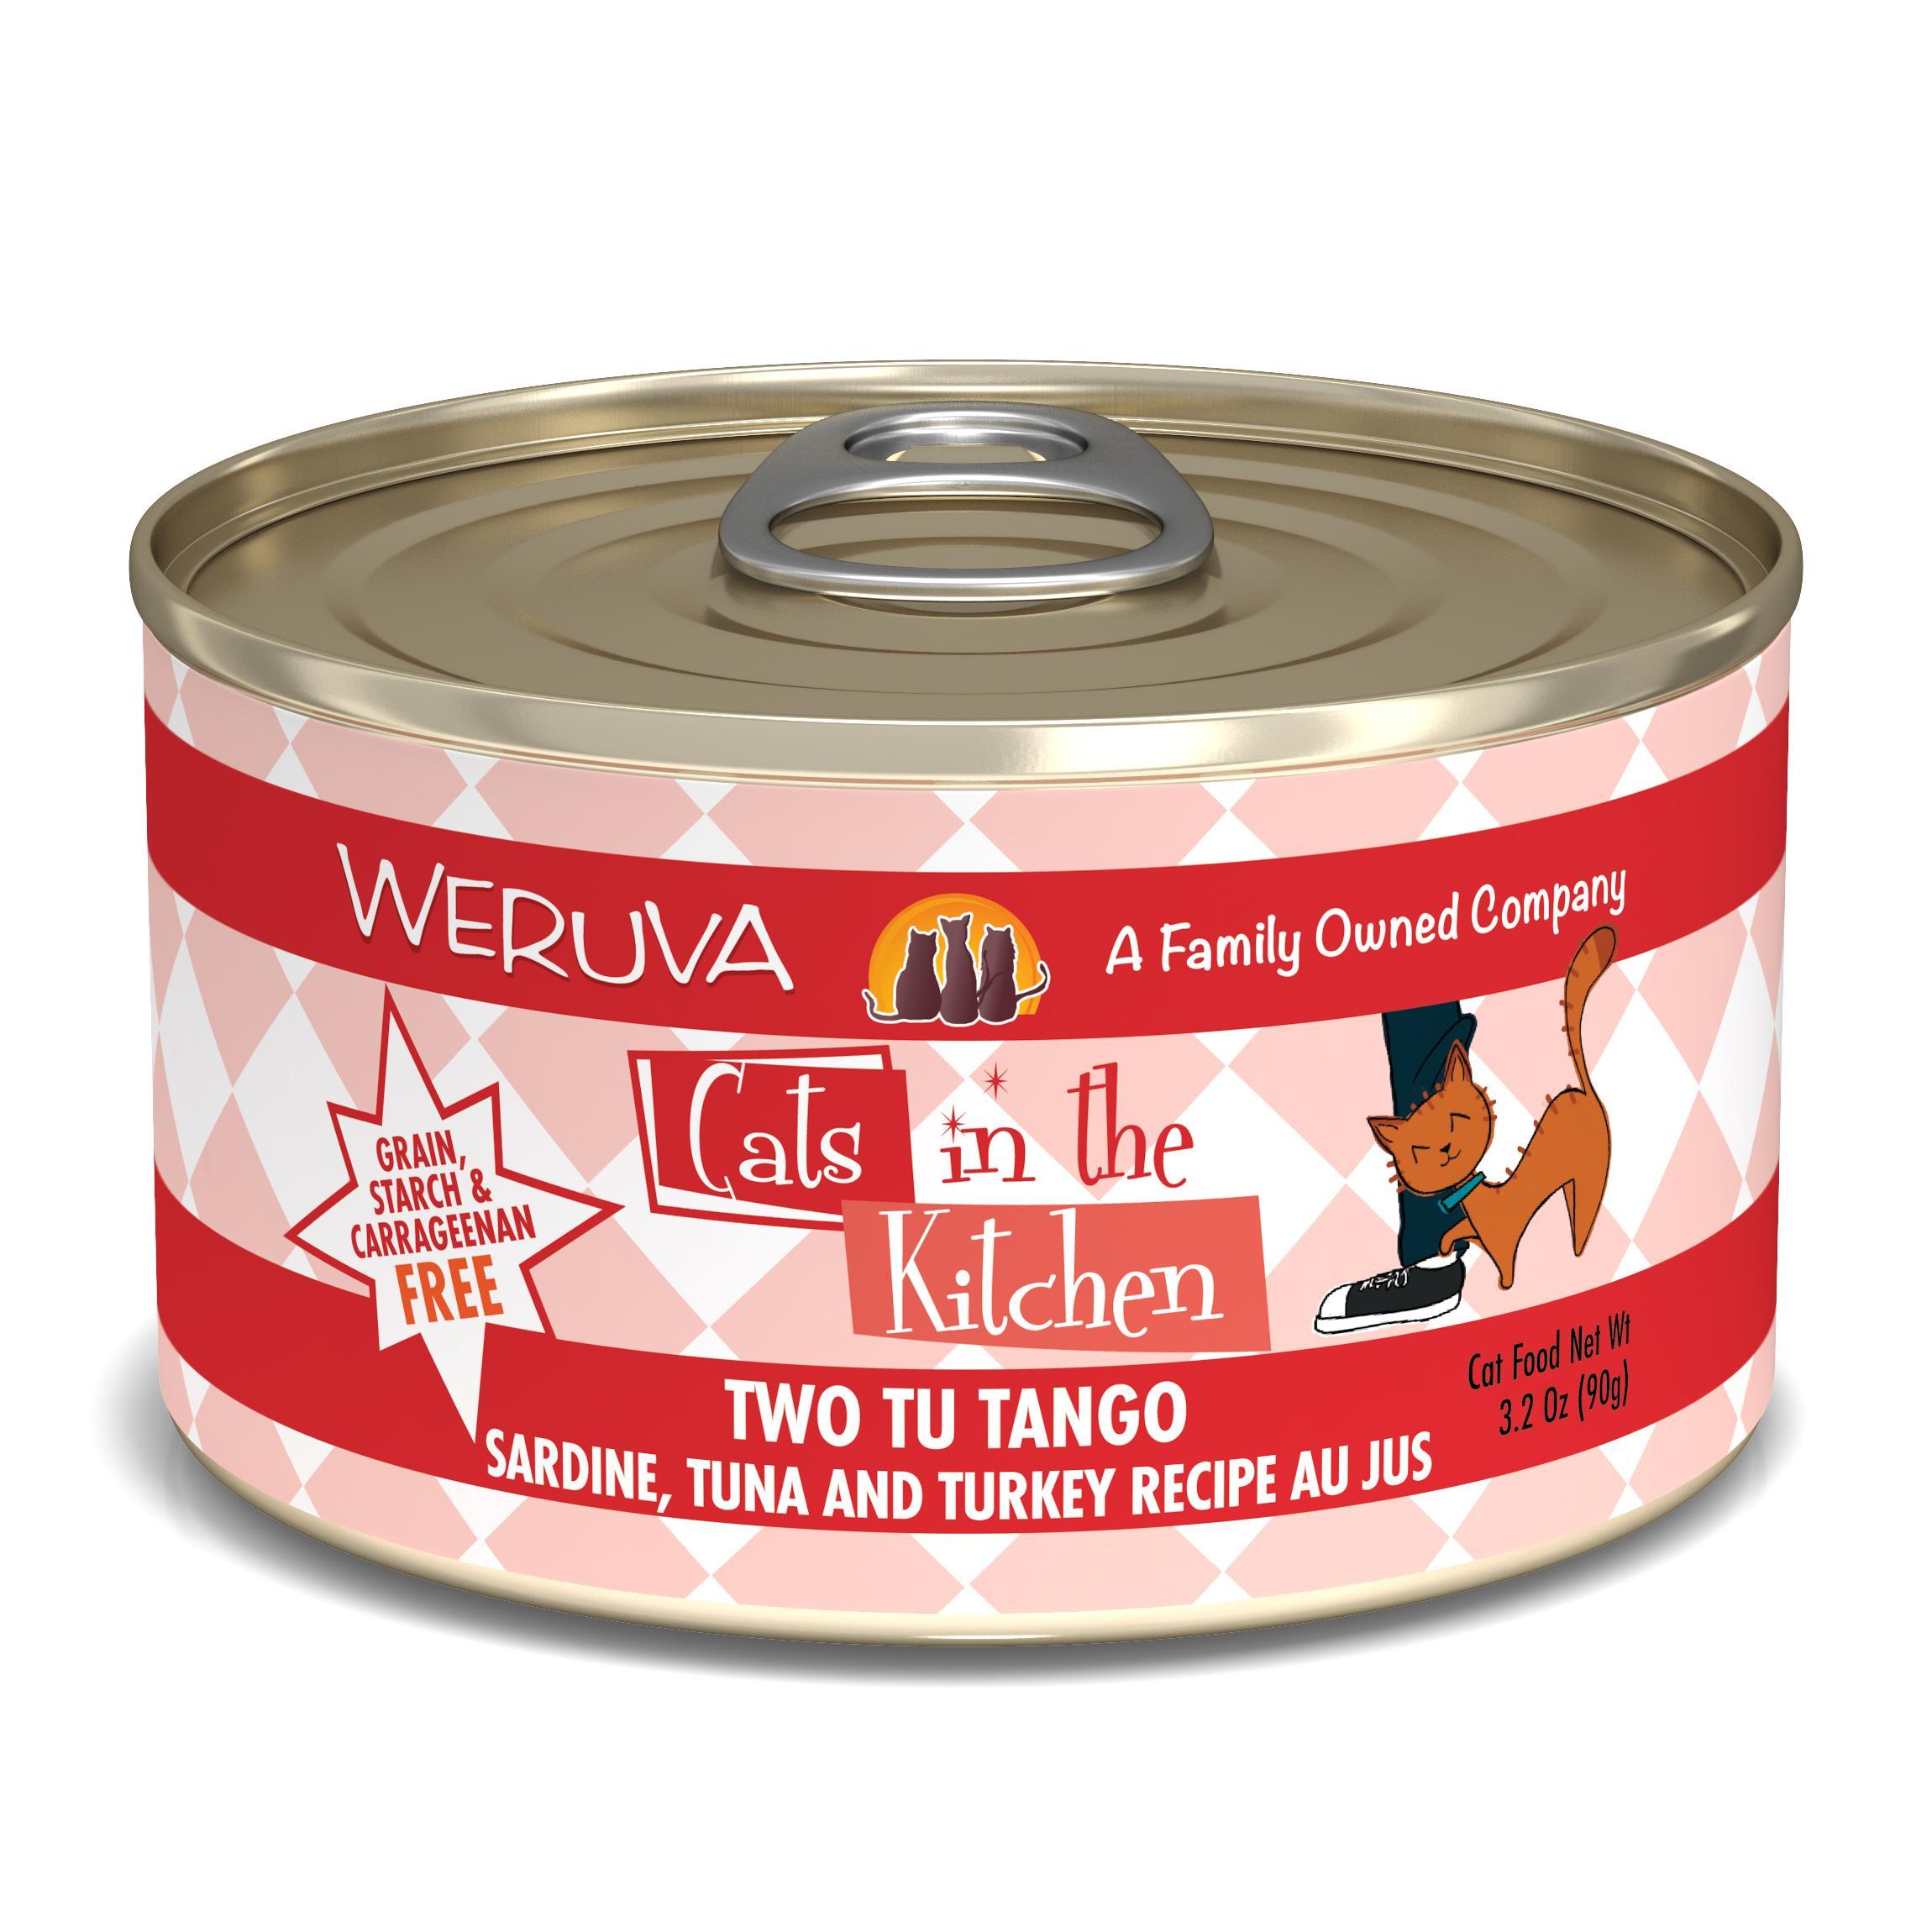 Weruva Cats in the Kitchen Two Tu Tango Sardine, Tuna & Turkey Au Jus Grain-Free Wet Cat Food, 3.2-oz